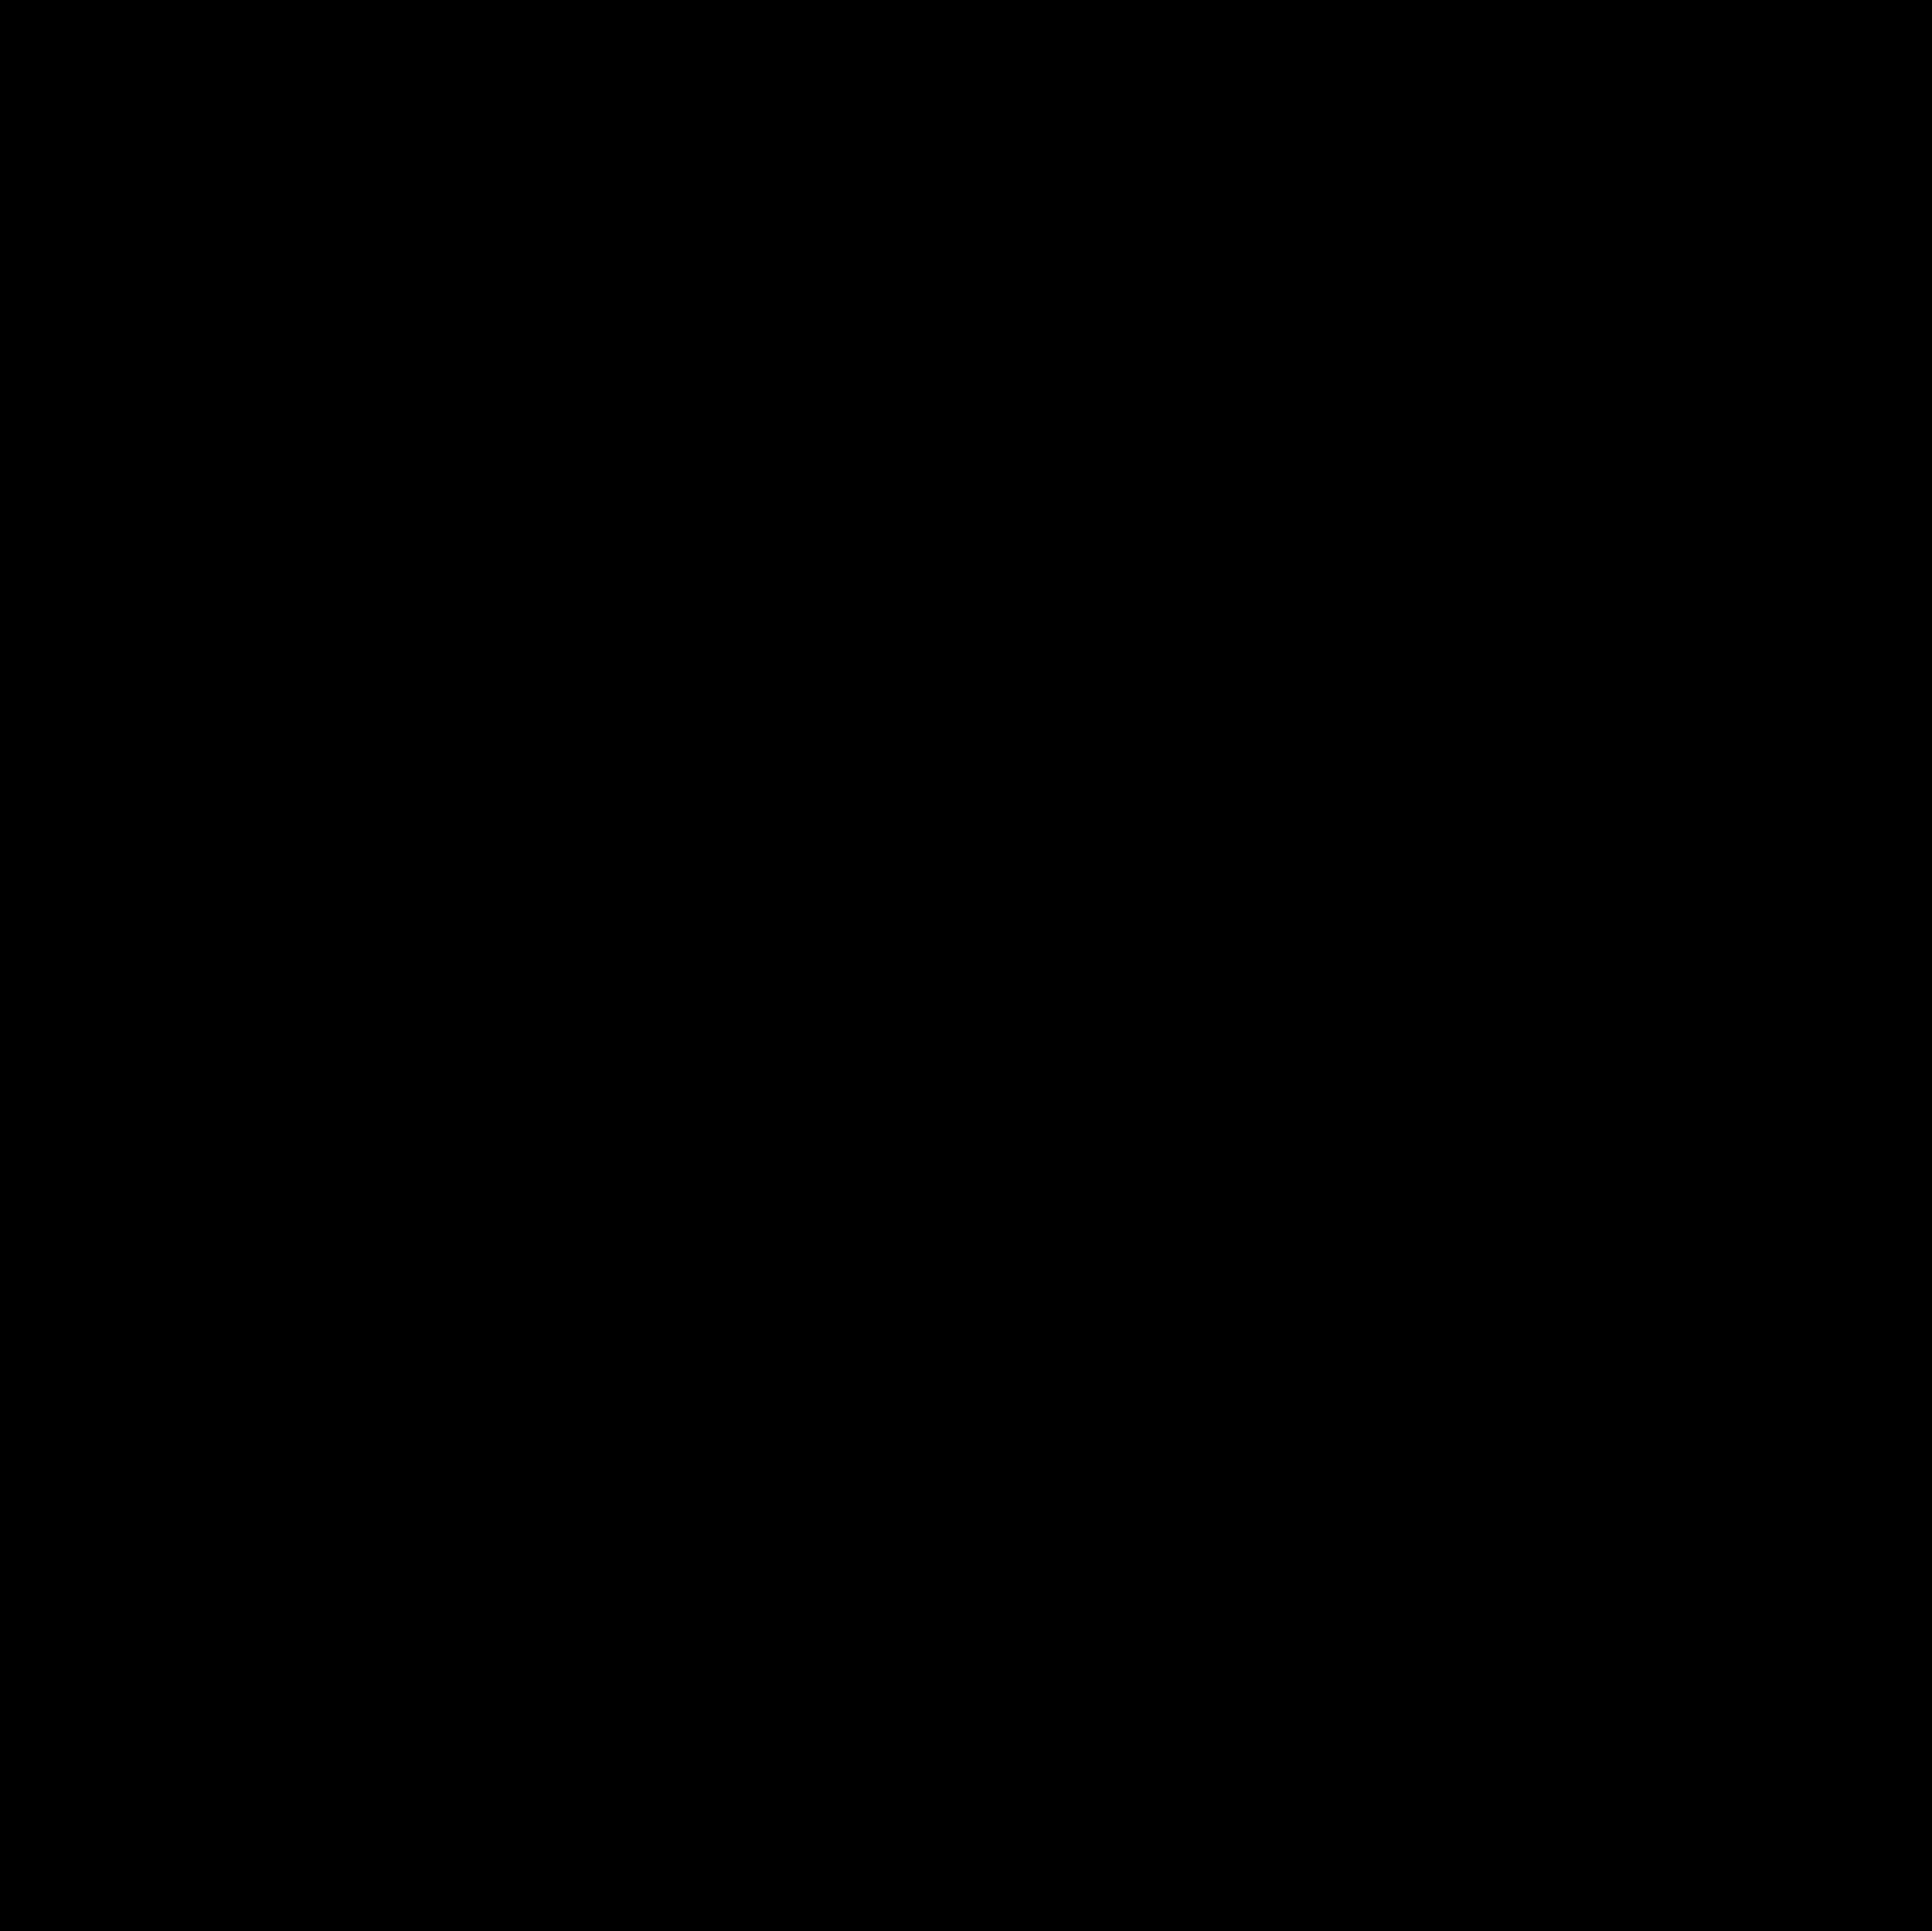 Elda Bertarini